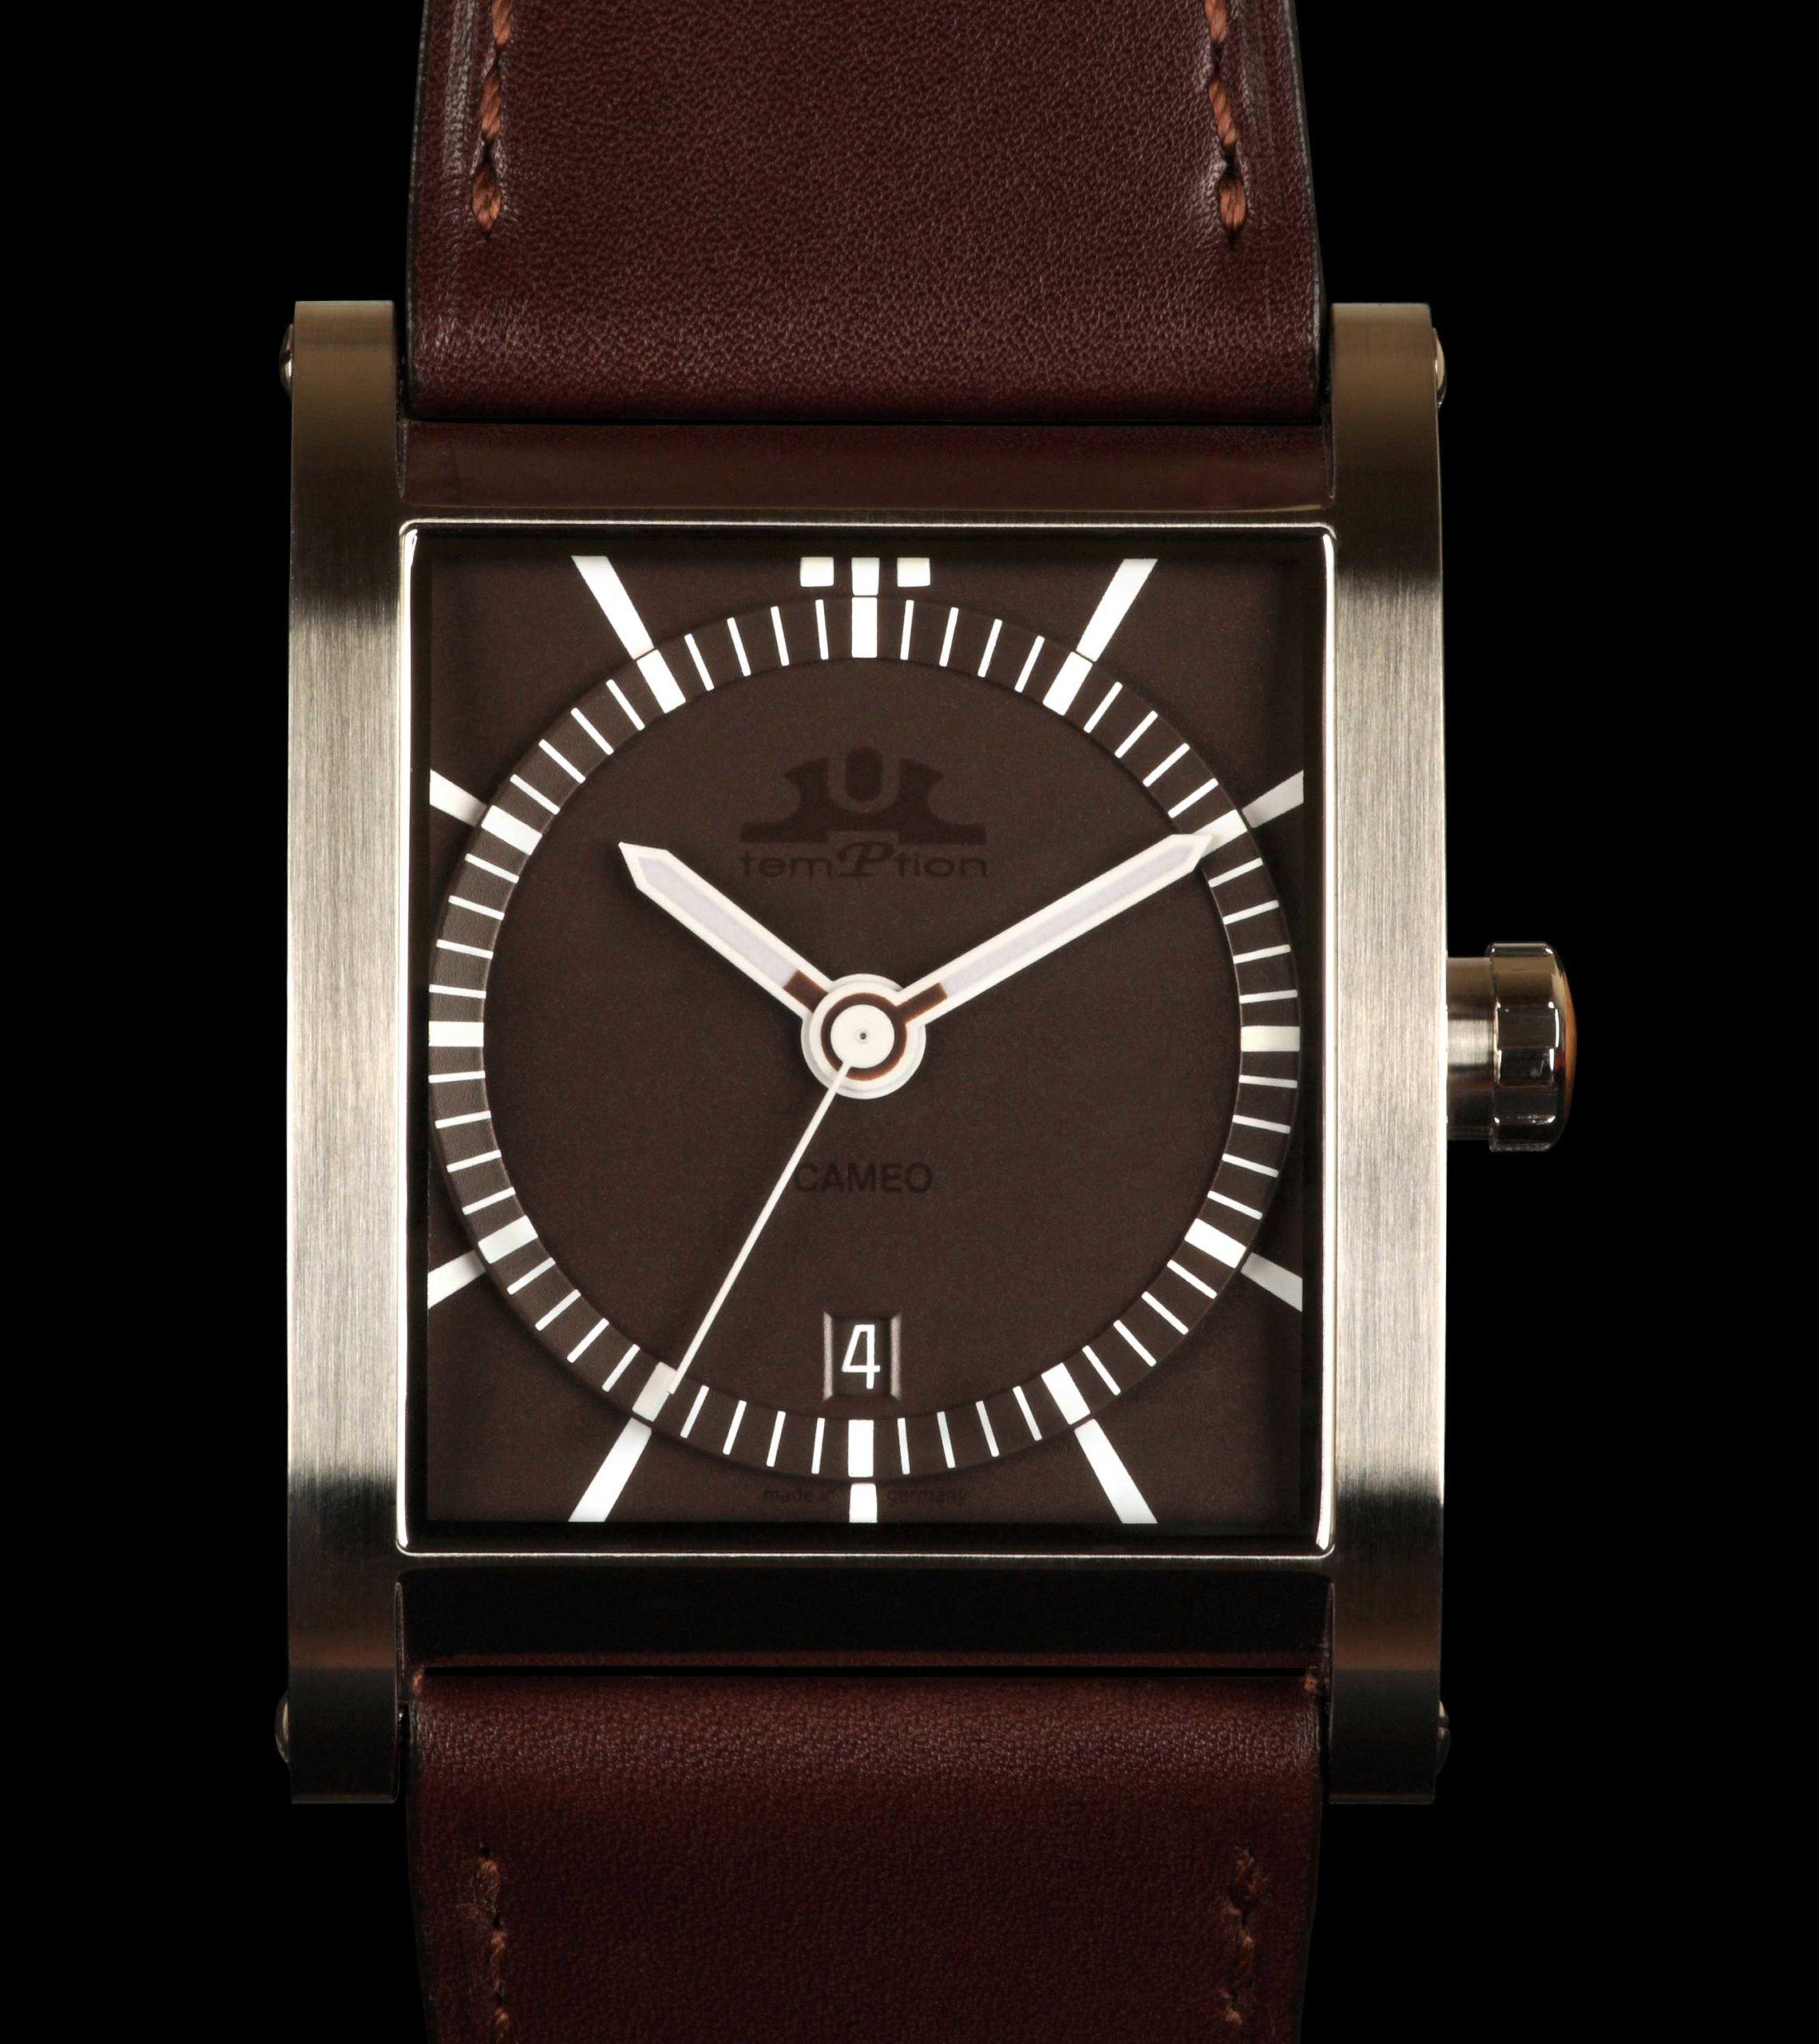 Armbanduhr Cameo von Temption